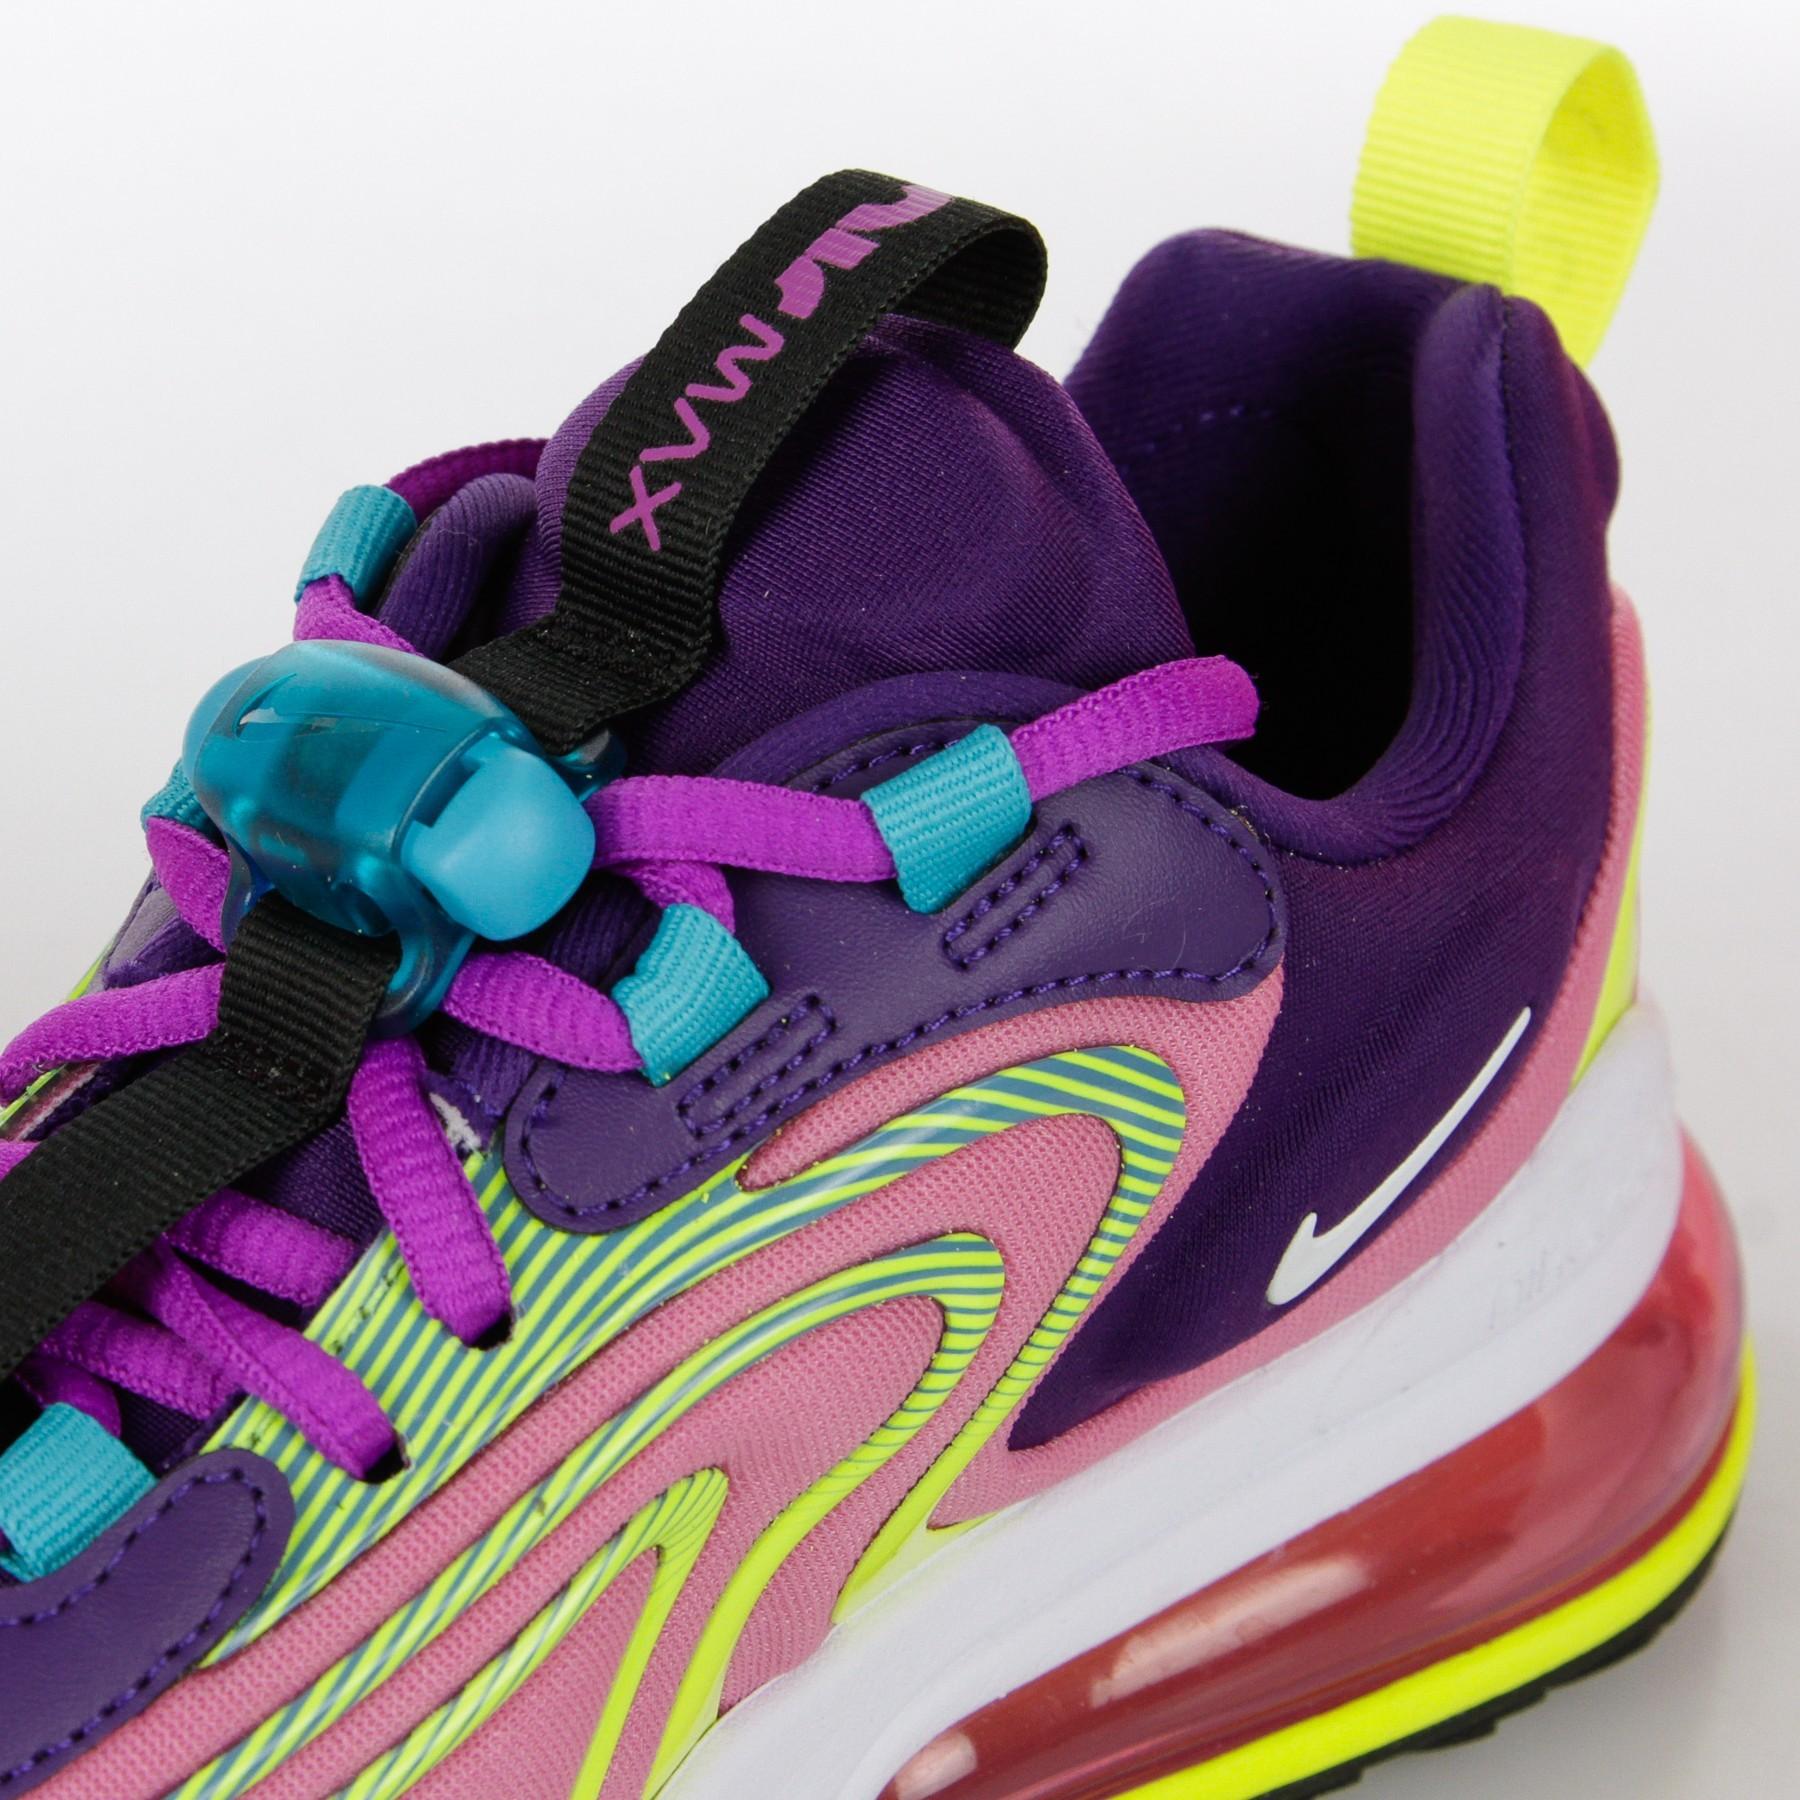 Nike W Air Max 270 React ENG EggplantWhite